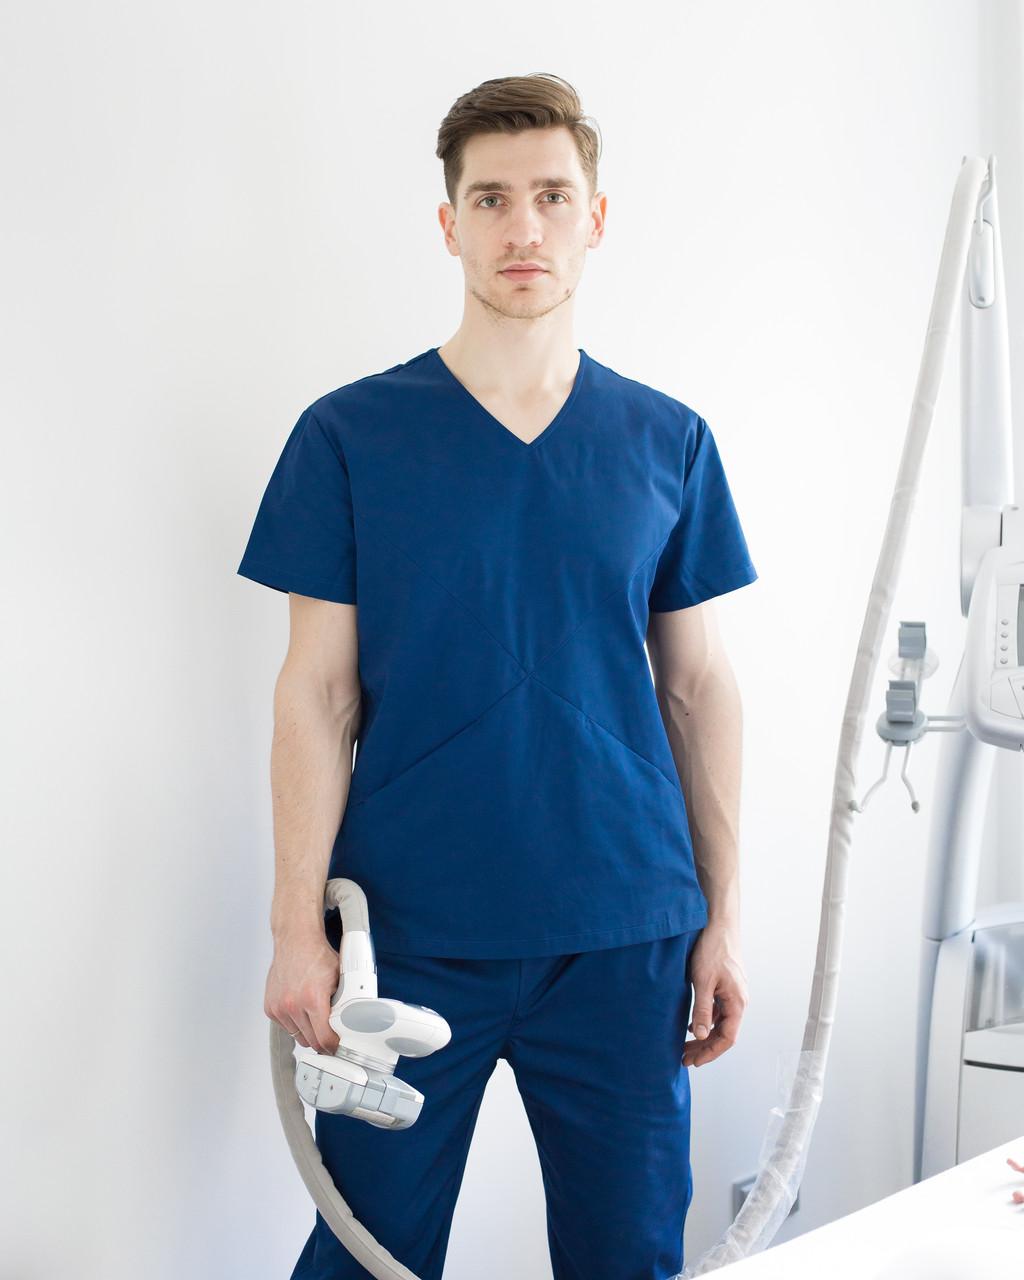 Медицинский мужской костюм Милан сапфир